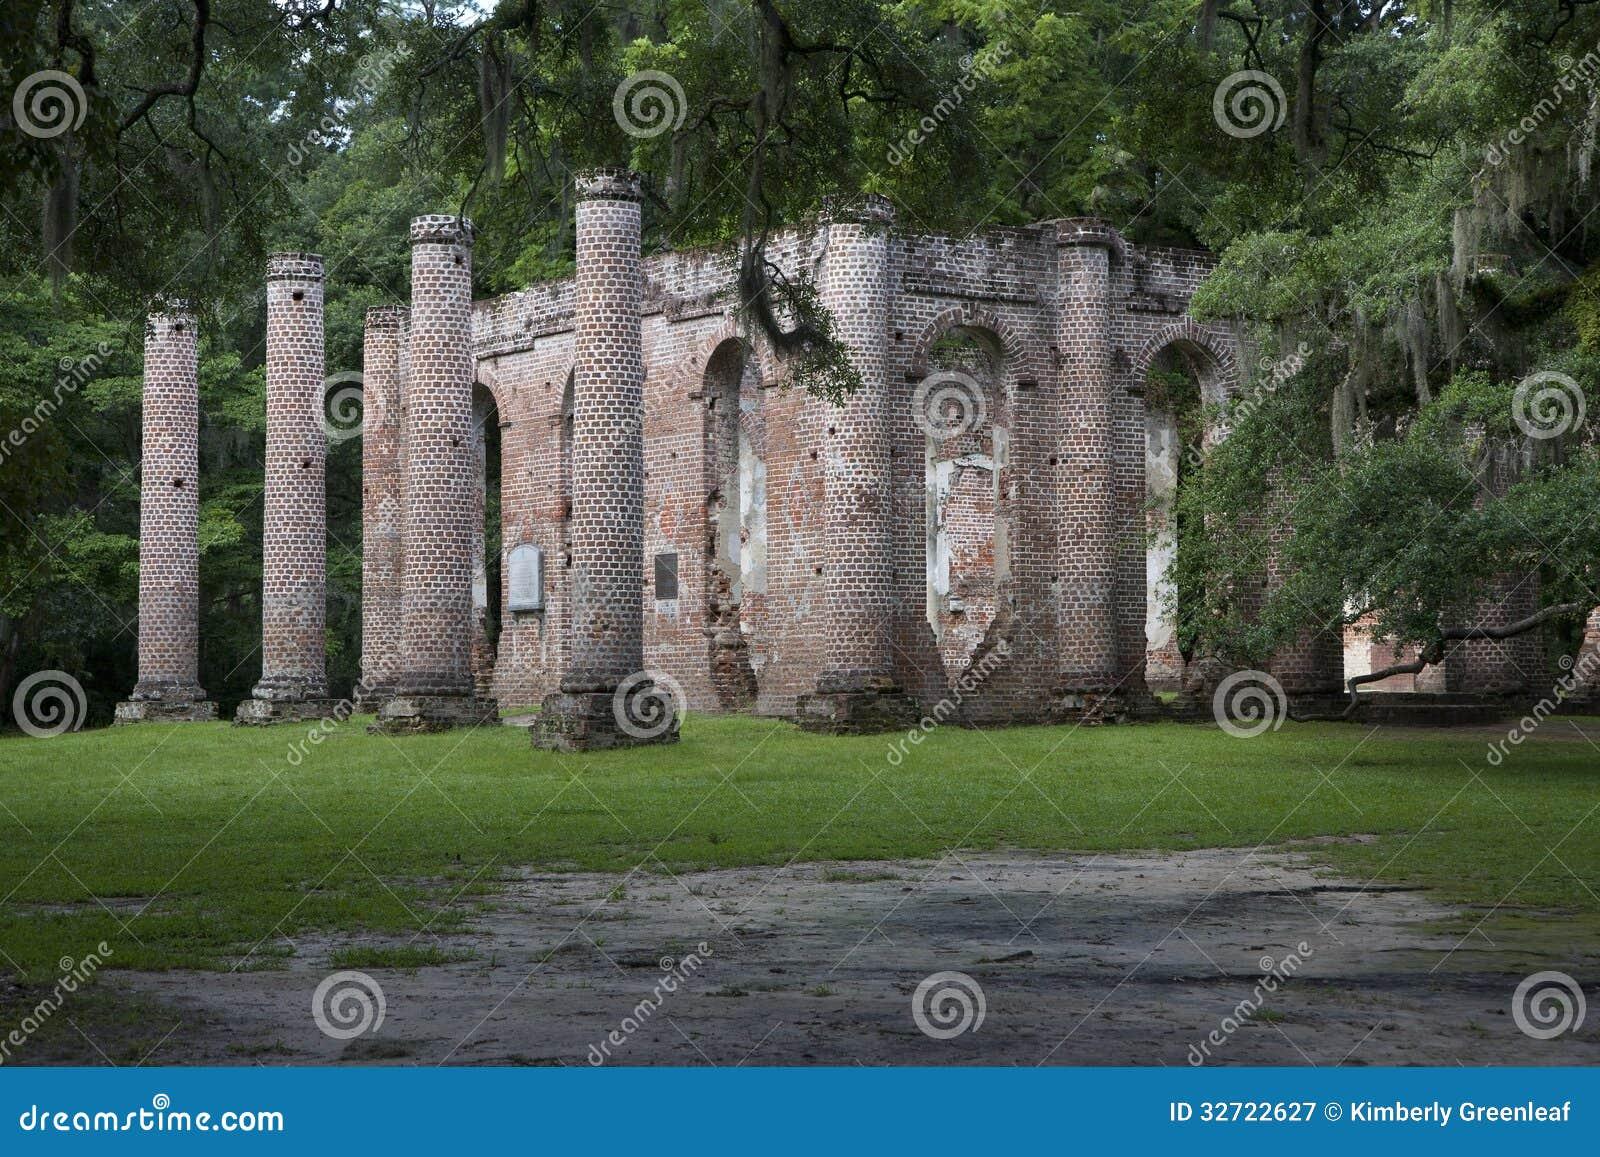 Old sheldon church ruins south carolina royalty free for 3d dreams fort mill sc